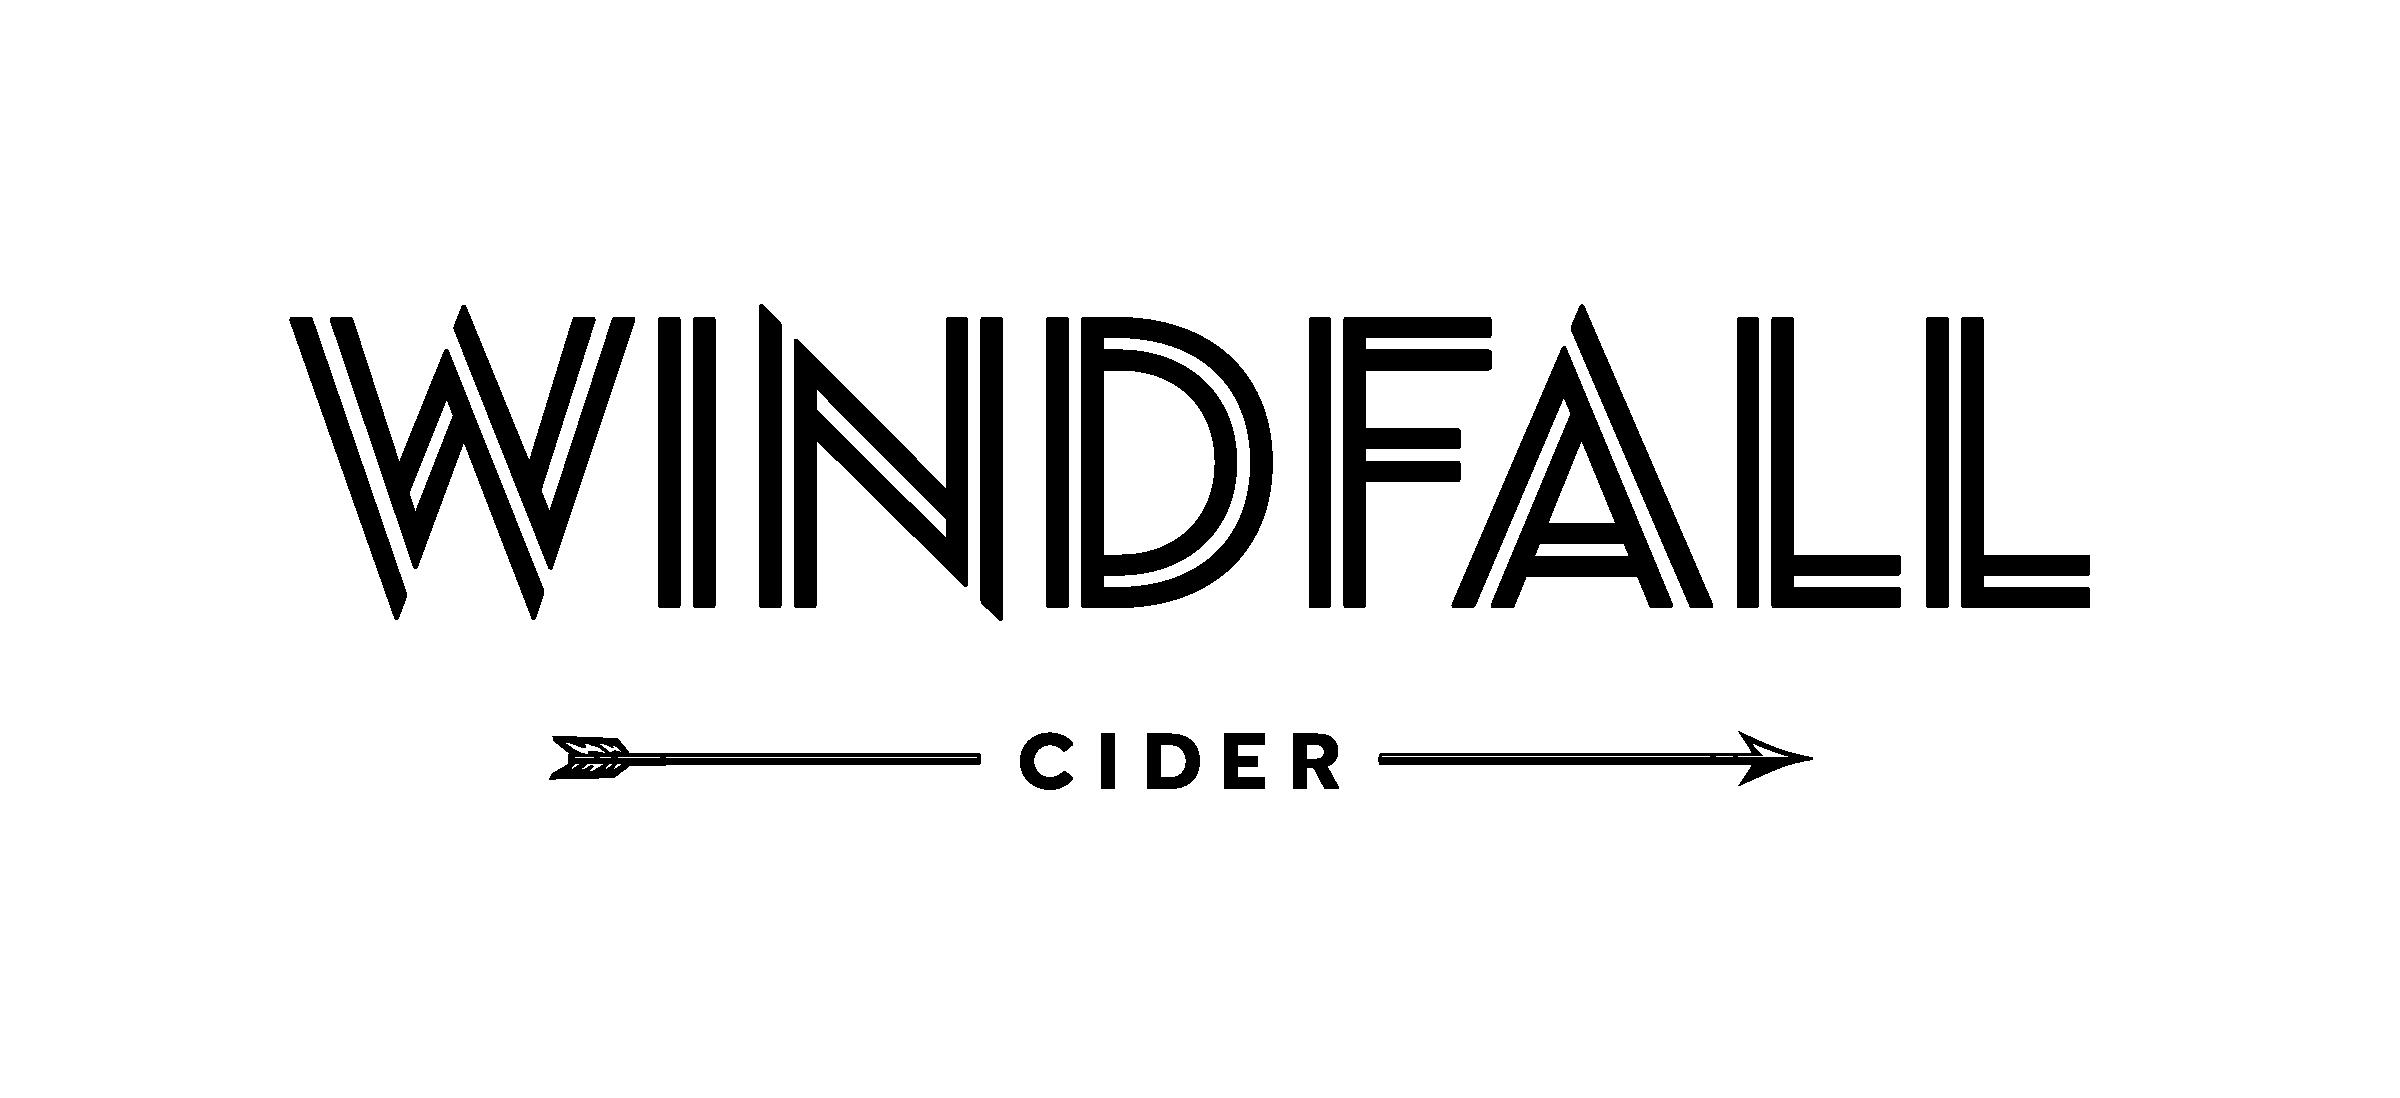 Windfall Cider Logo